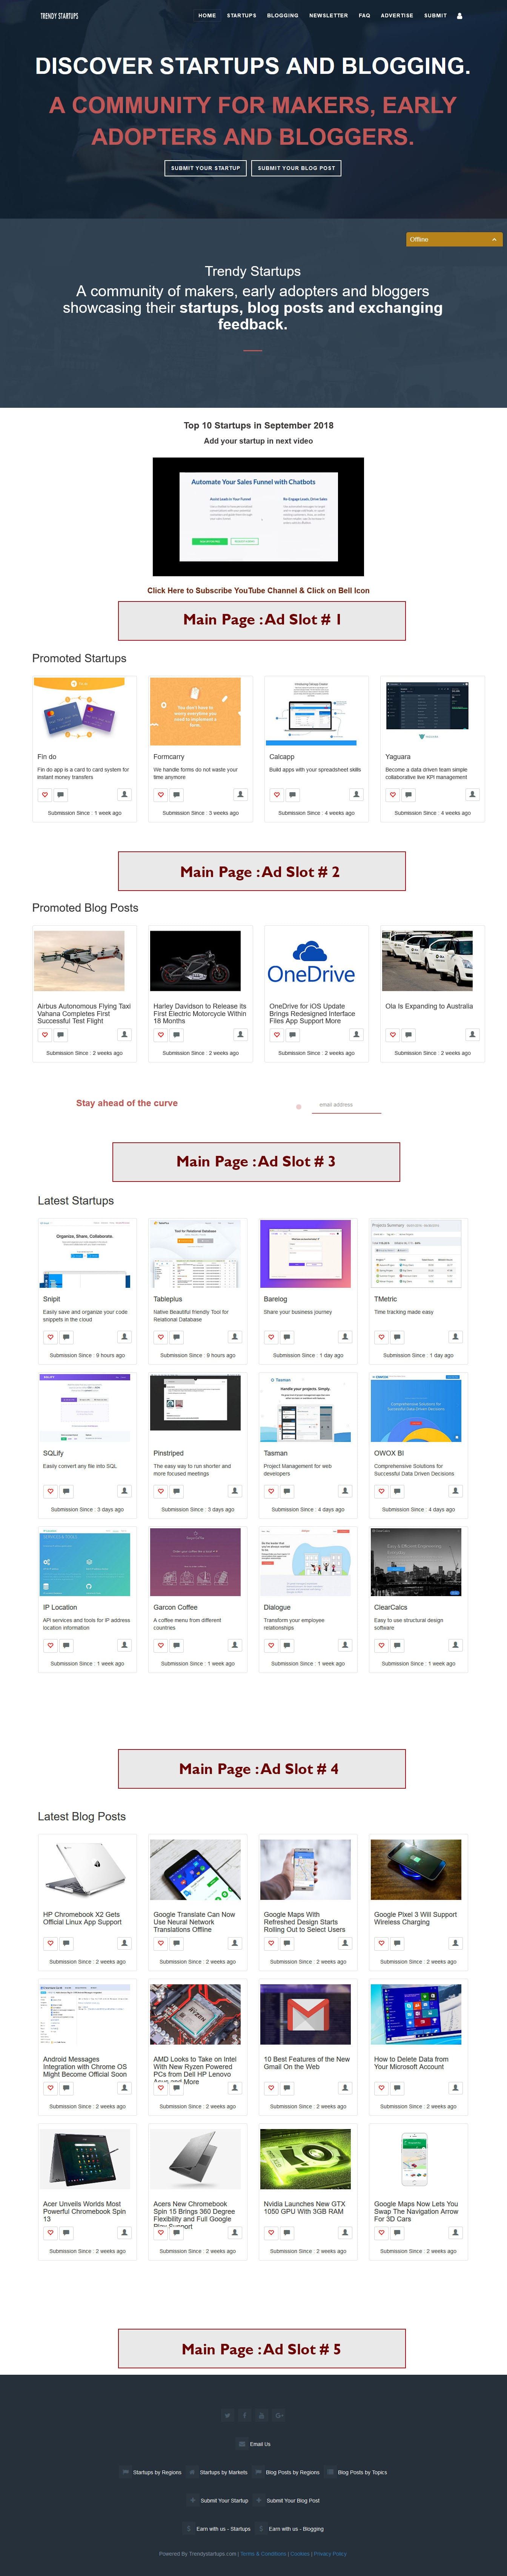 Main page Ads